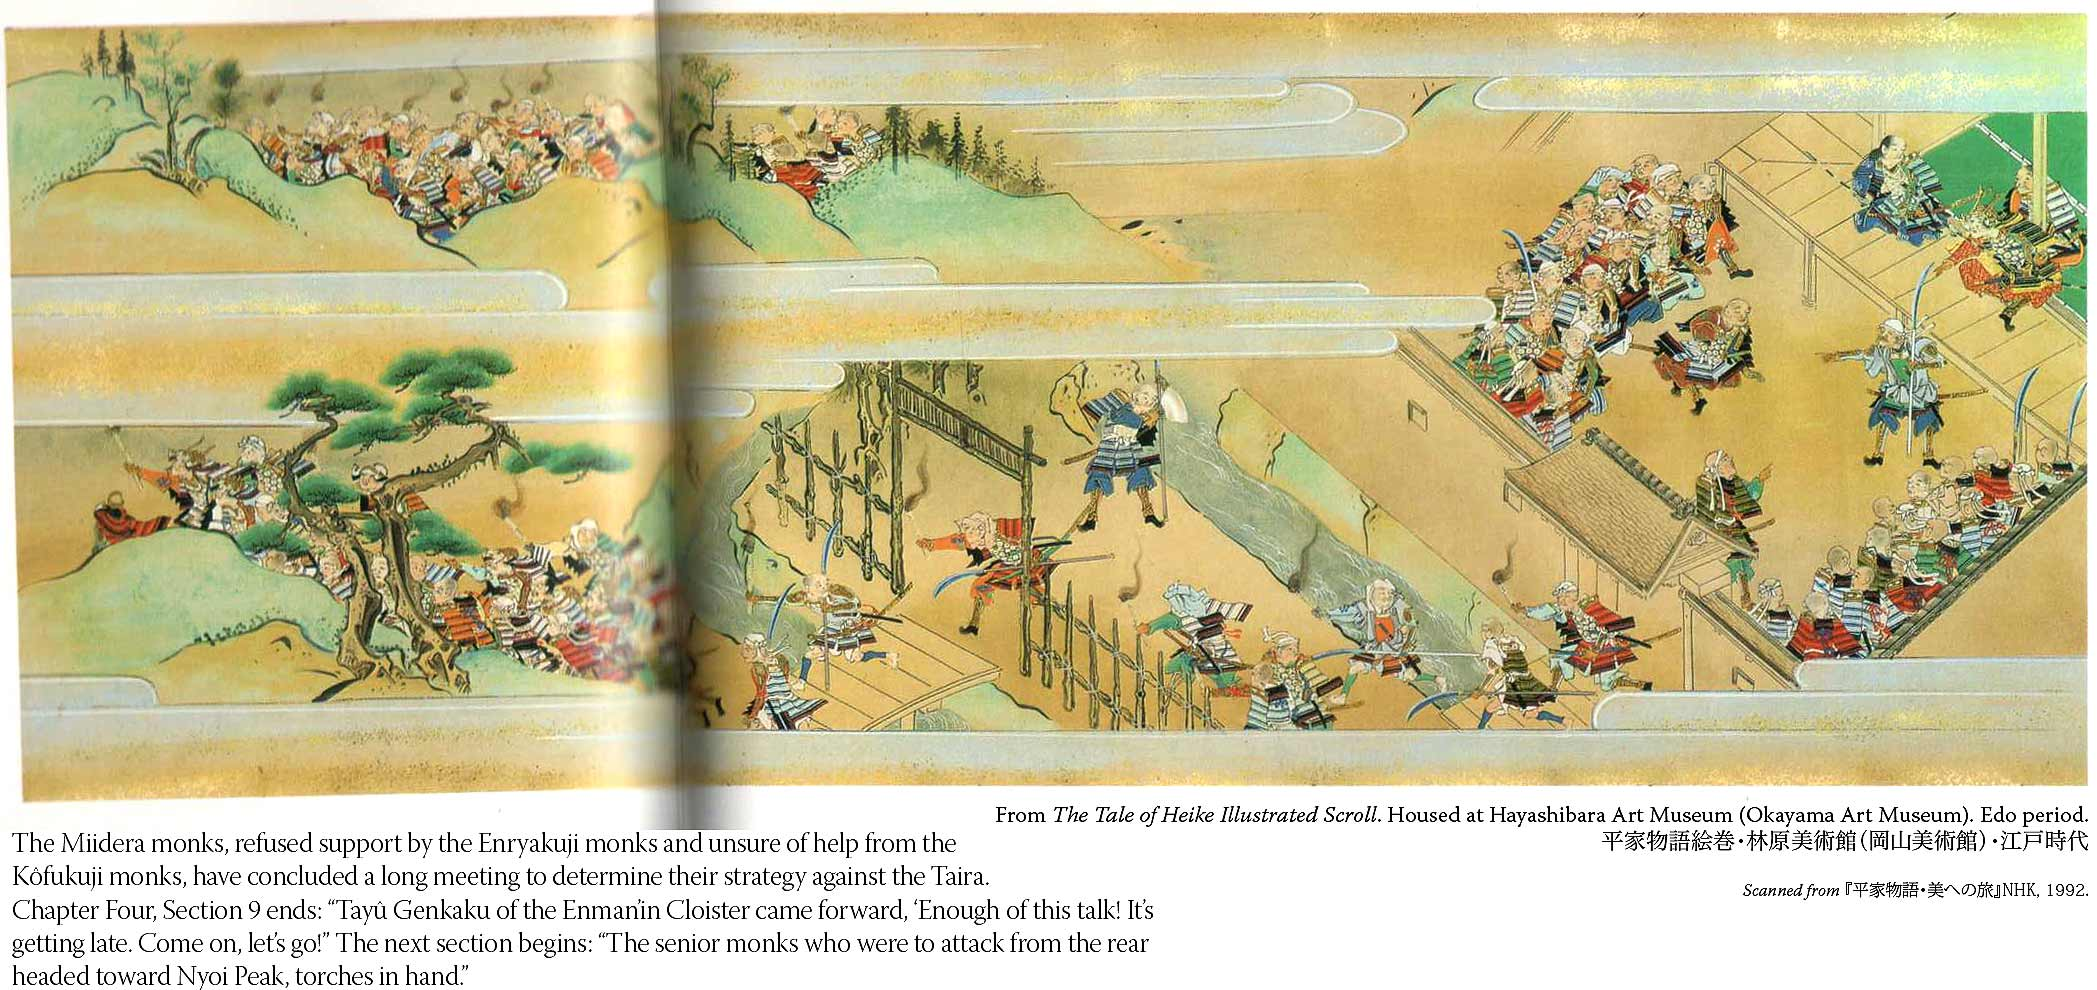 tale of the heike The tale of the heike waterscreen scrolls: genpei yashima battle - fountains of bellagio teamlab, 2016,calligraphy: sisyu, sound: hideaki takahashi, biwa, narration:yoshiko sakata.